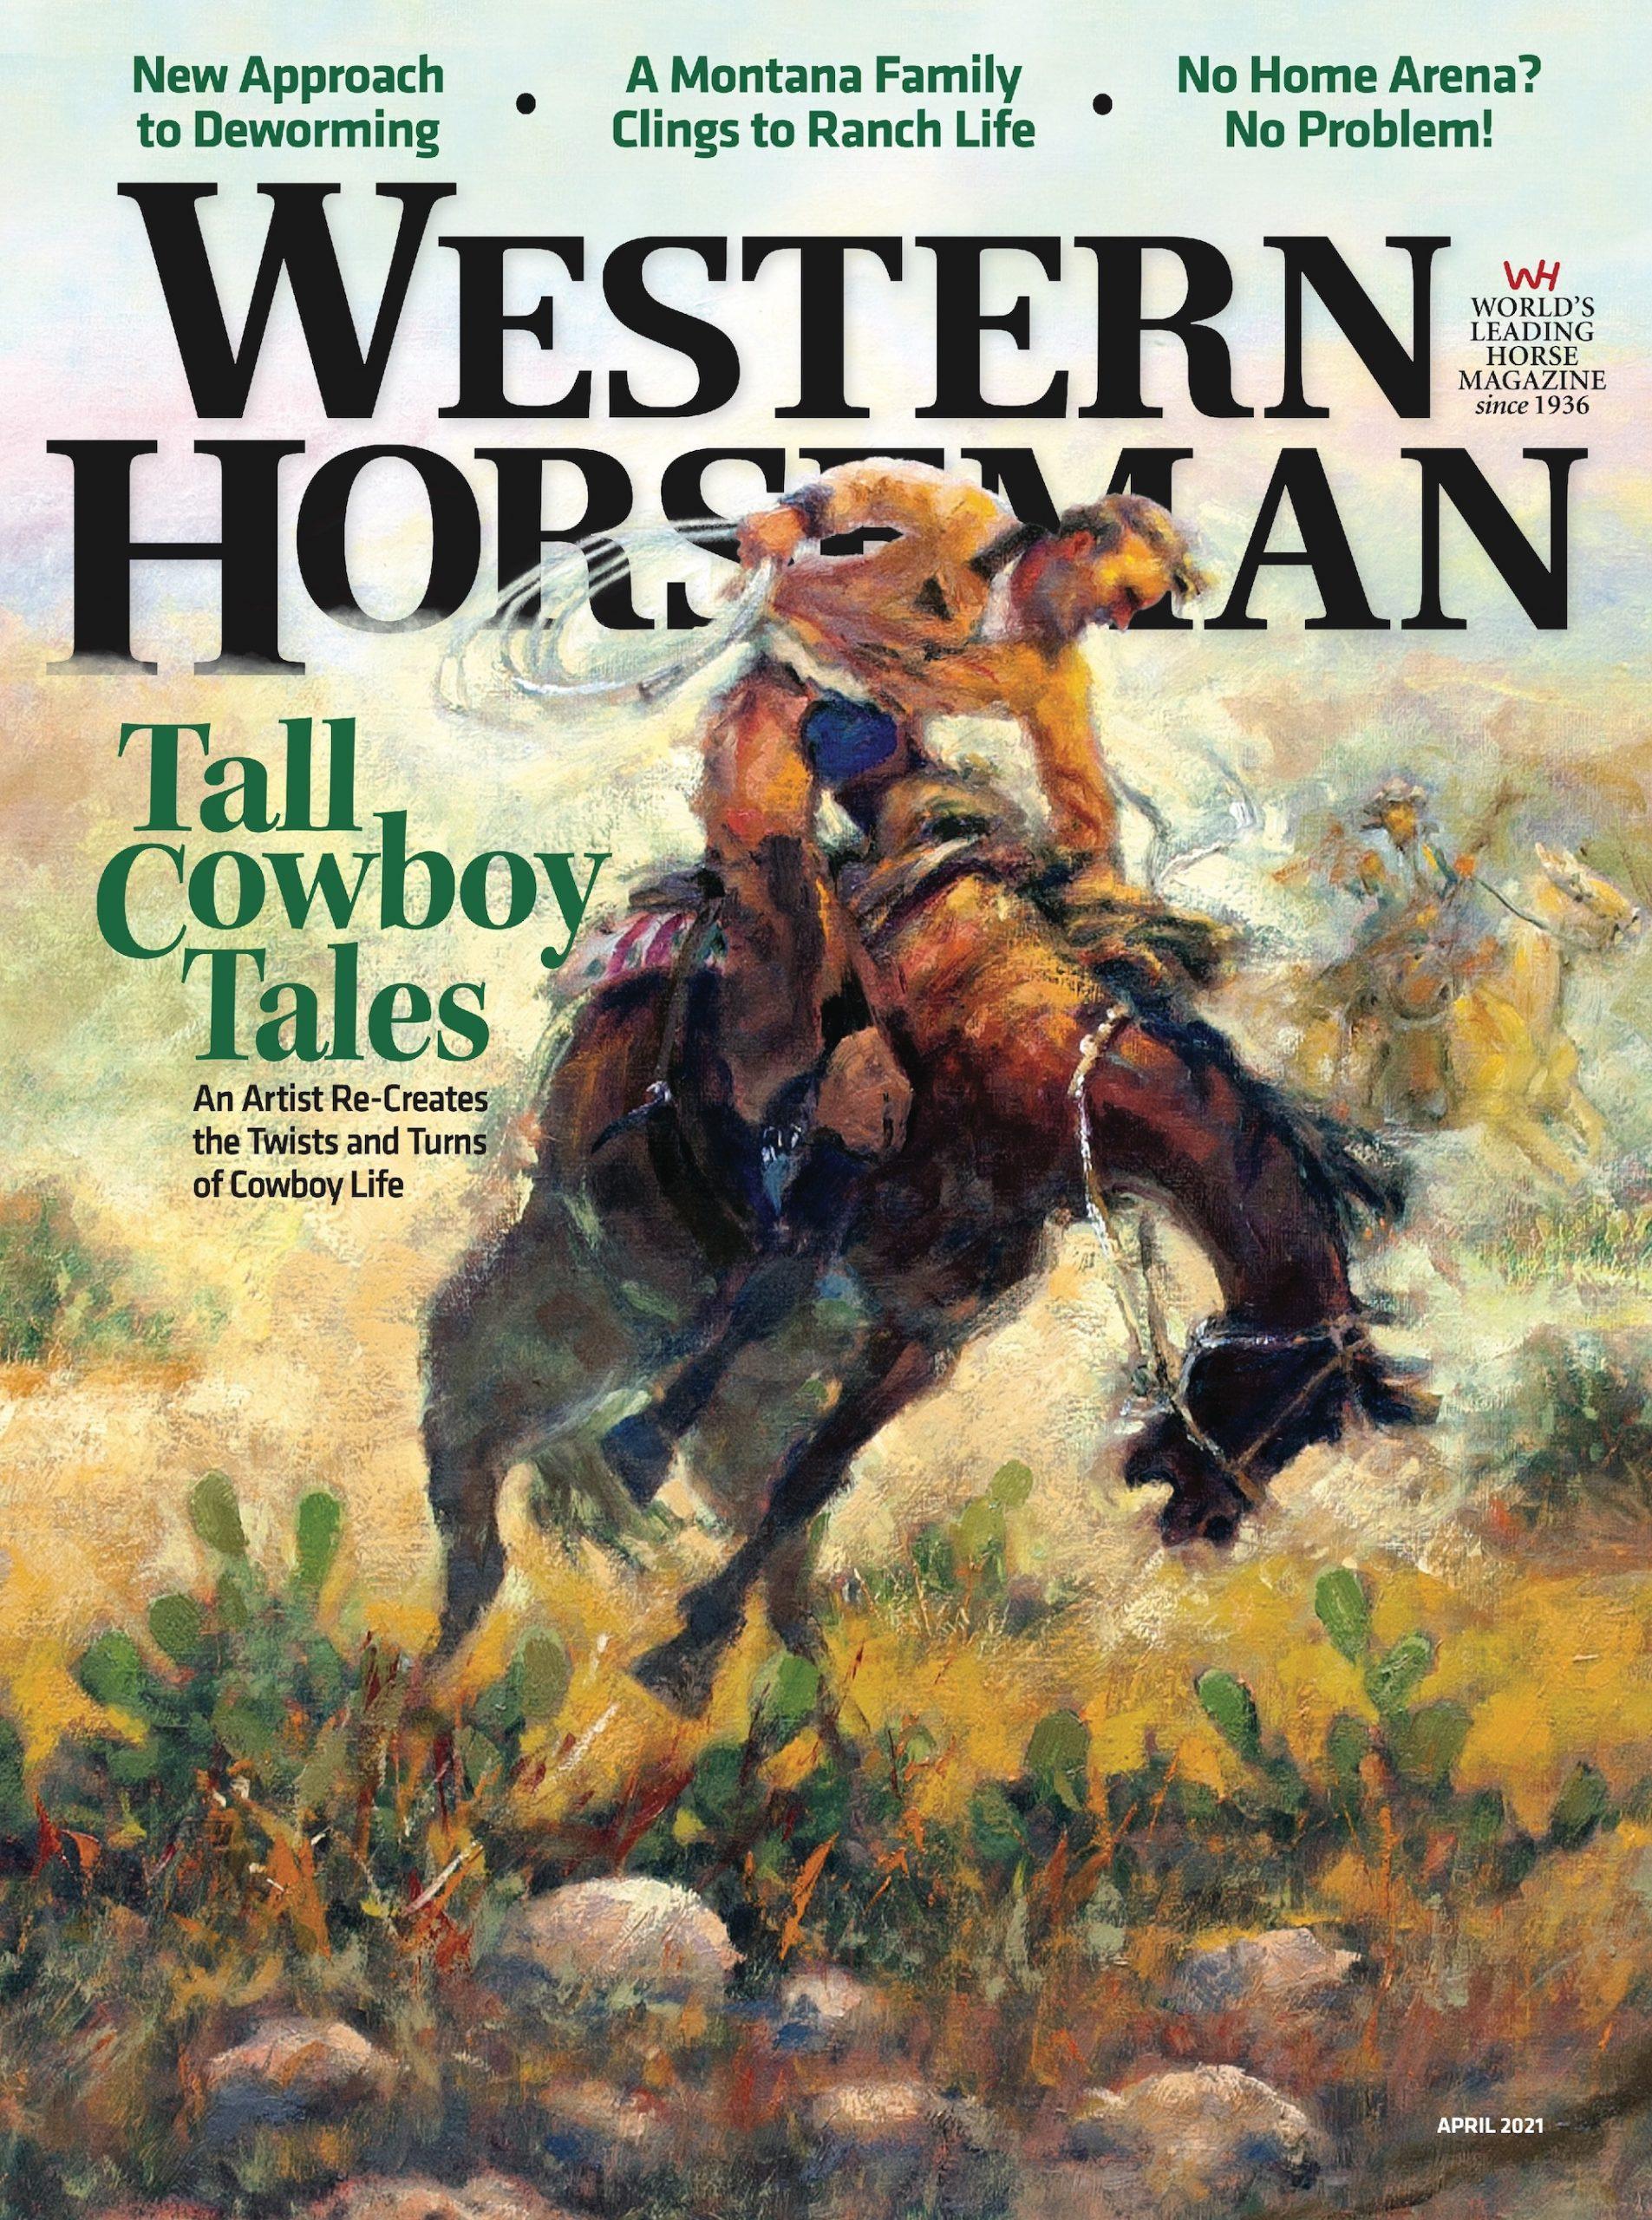 Western Horseman magazine April 2021 cover